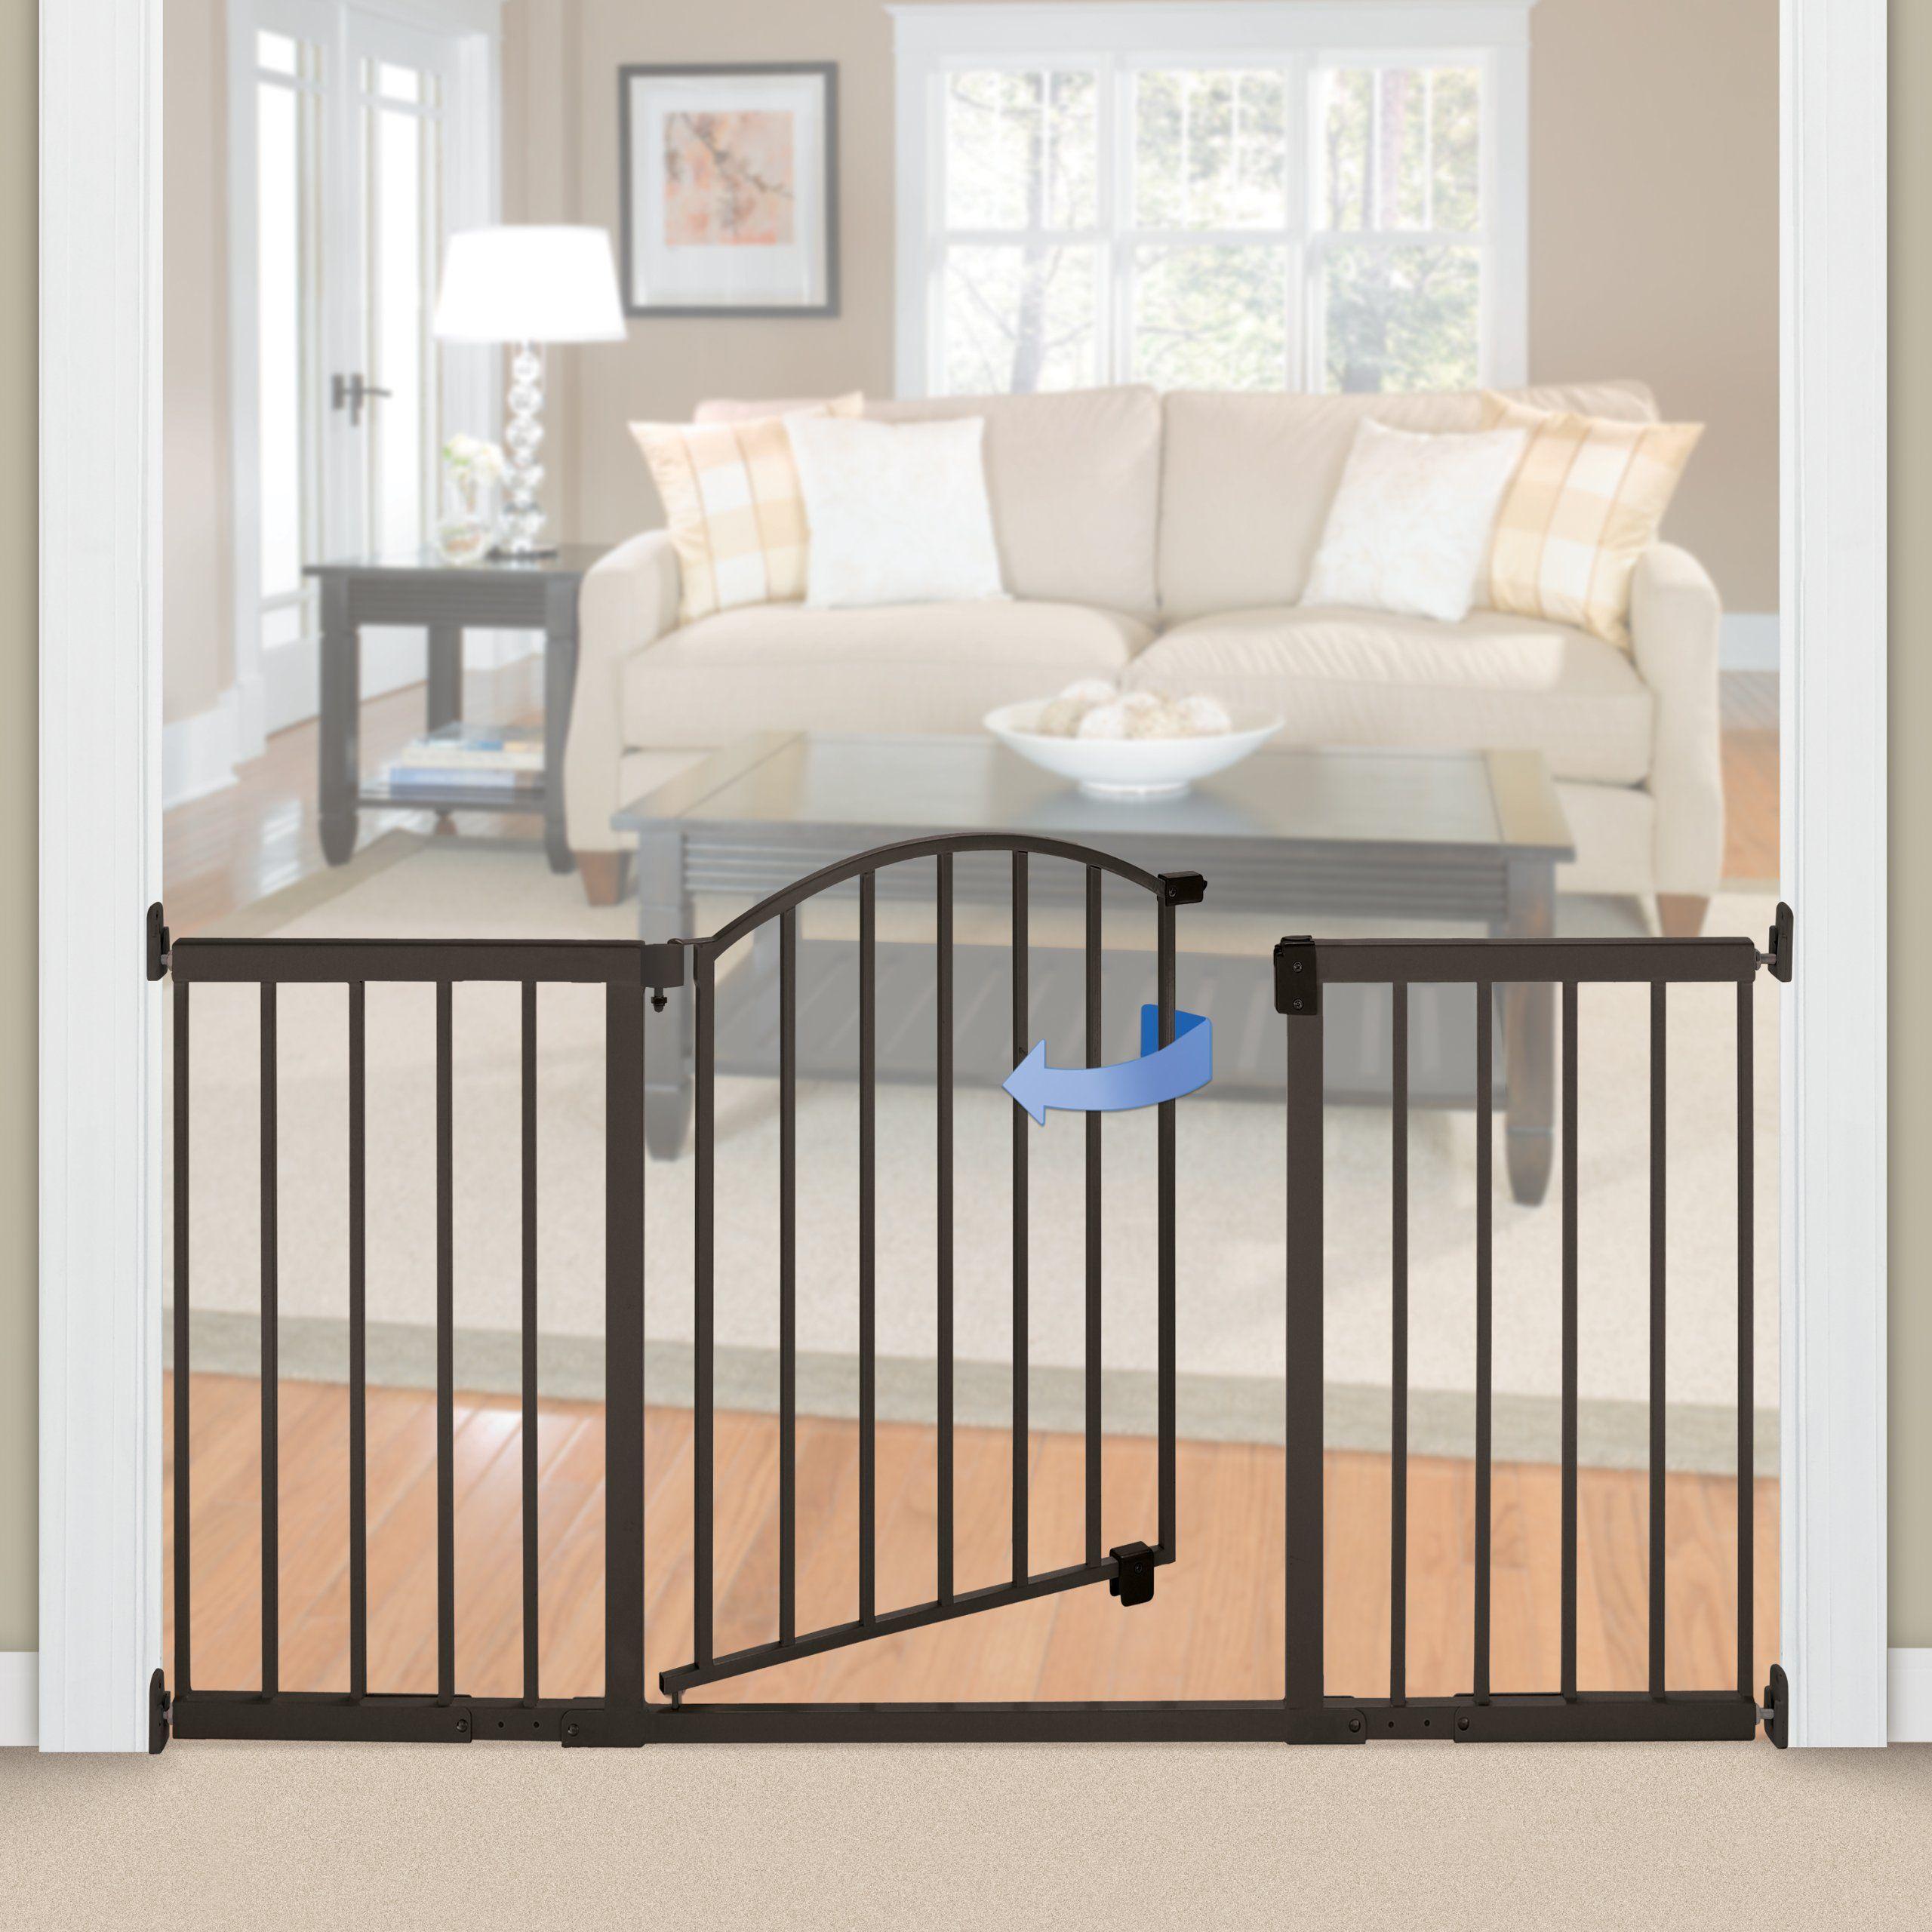 Summer Infant Metal Expansion Gate 6 Foot Wide Extra Tall Walkthru